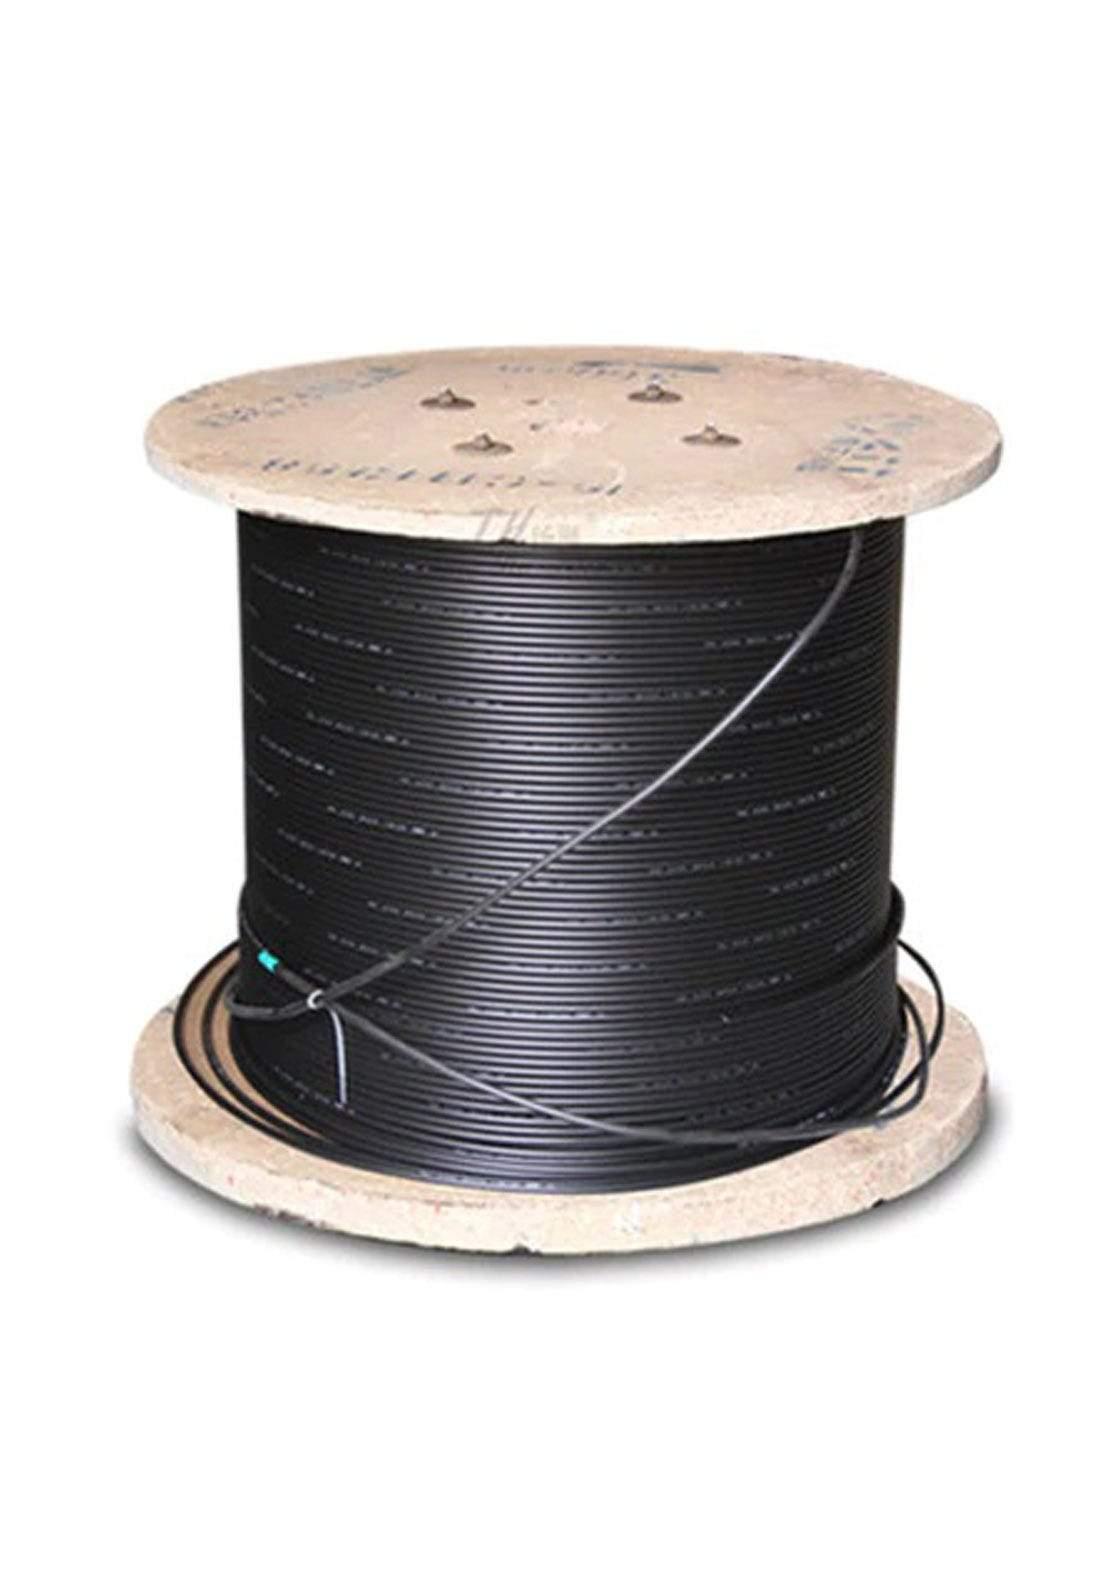 STS (GYXTY-6B1) 6 Core Fiber Optic Cable - Black كابل ضوئي